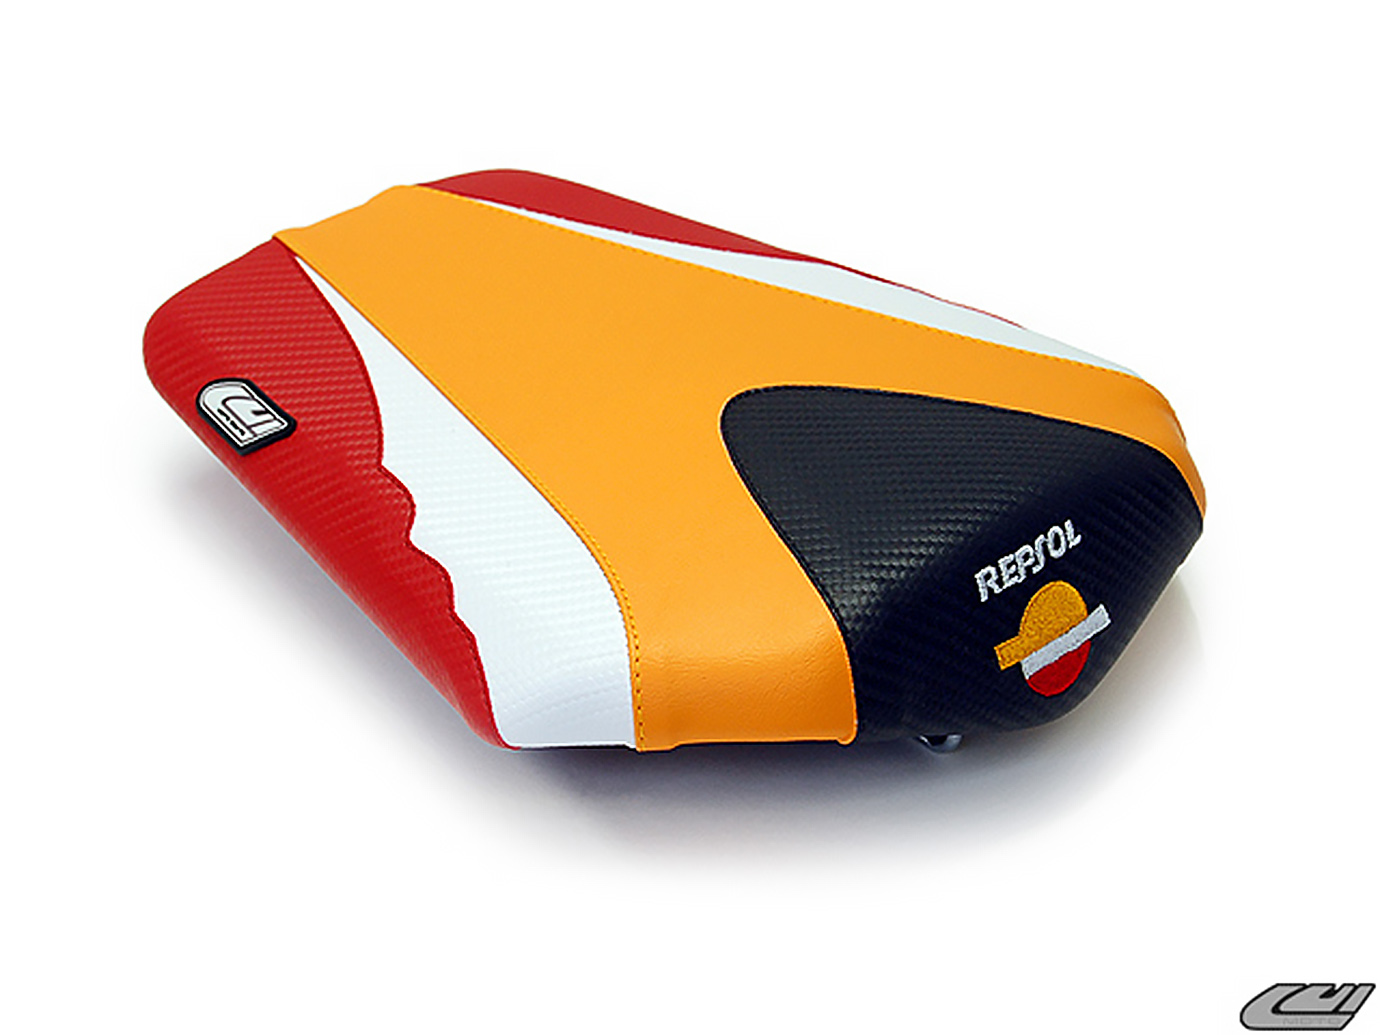 HONDA (Repsol 2008-2011 CBR1000RR 2113201) 2008-2011 [ LUIMOTO ] タンデムシートカバー (Repsol 2113201), アースワードpc-shop:b13b3aef --- sunward.msk.ru